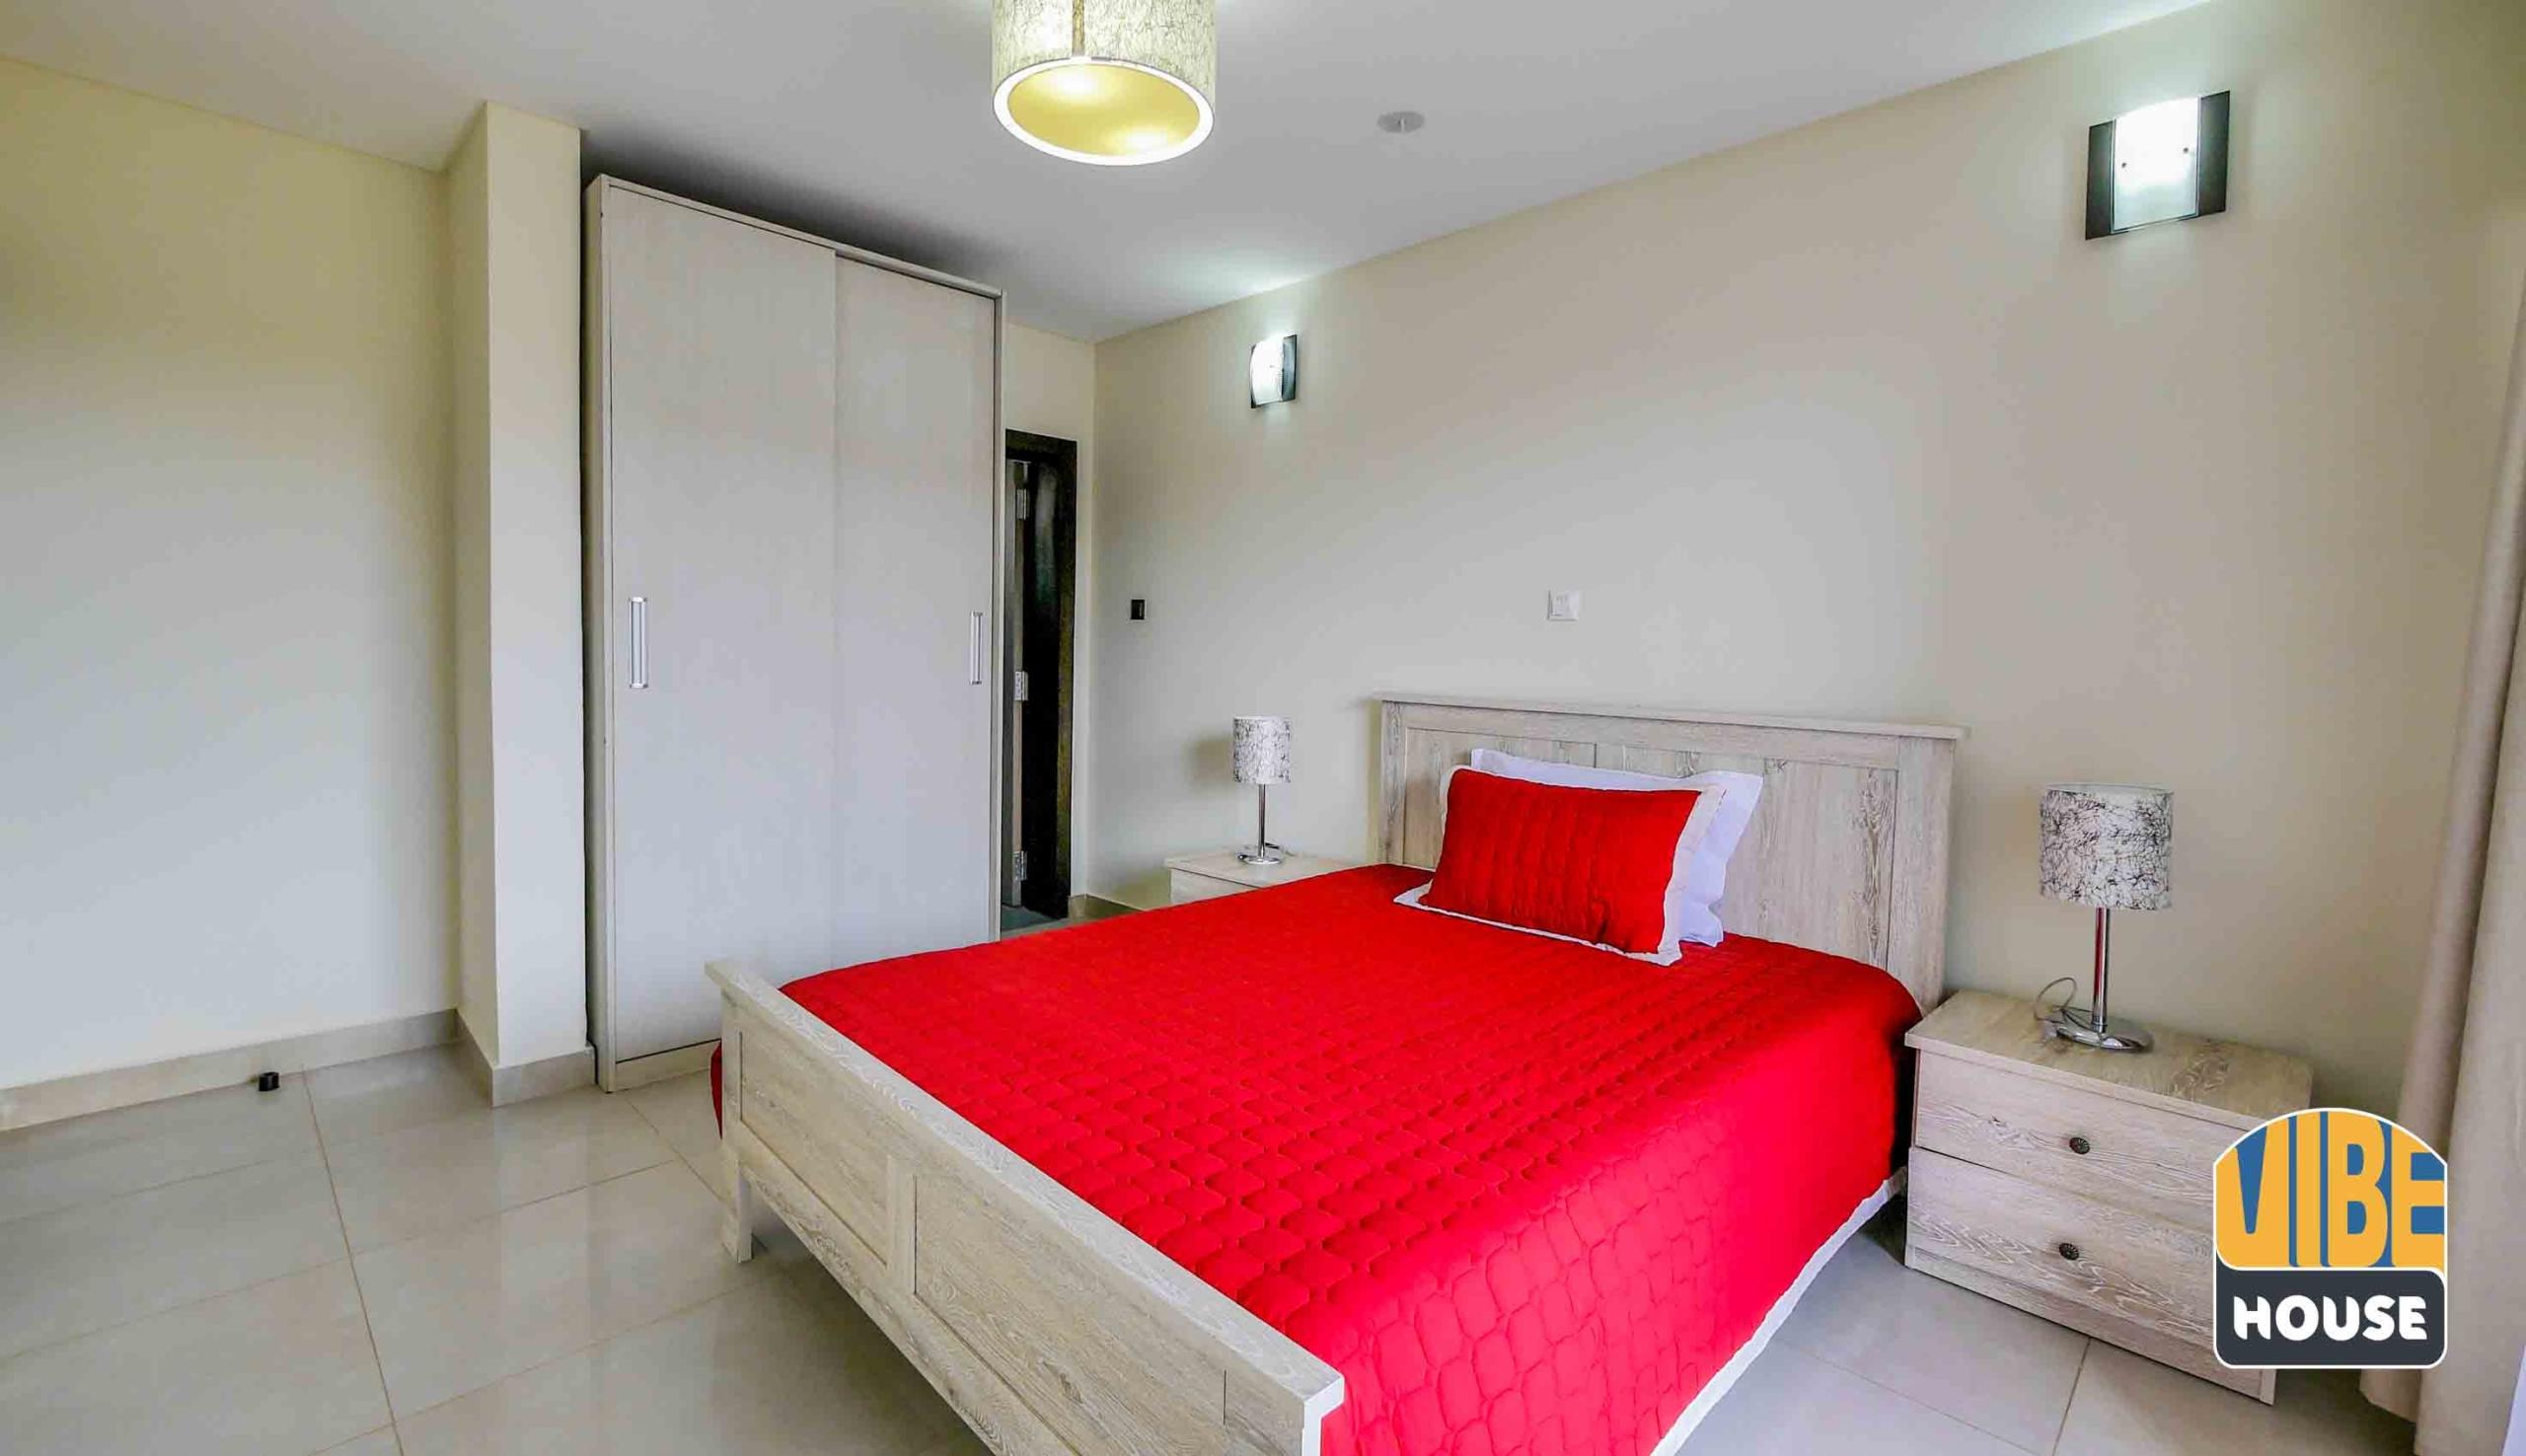 House For Rent Kigali Kagugu 19 04 01 1 7 scaled